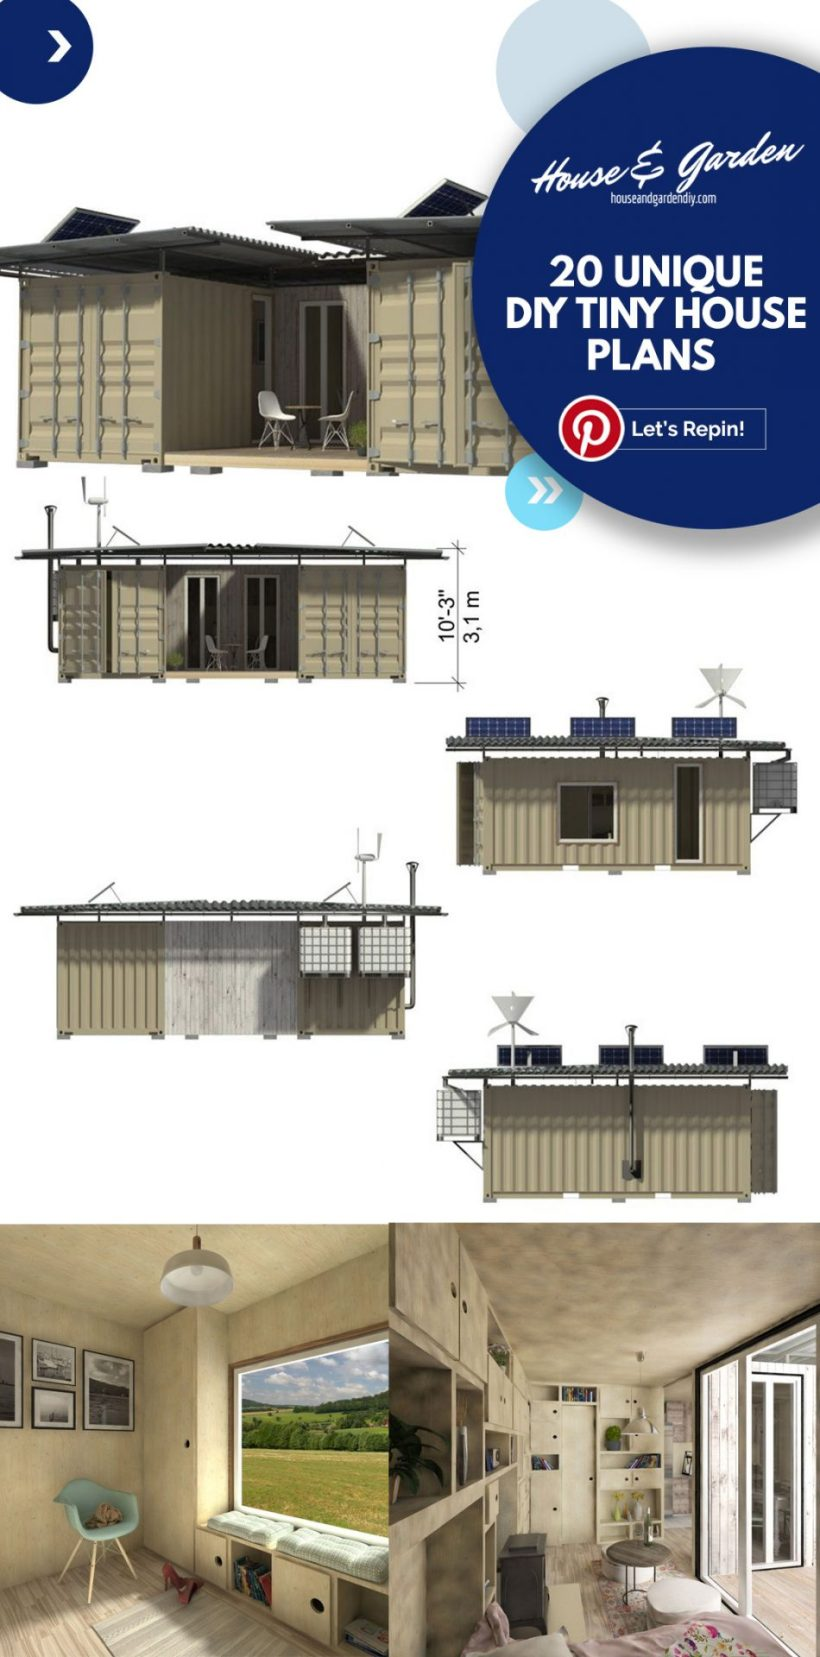 Planos de casas pequeñas de 8x24